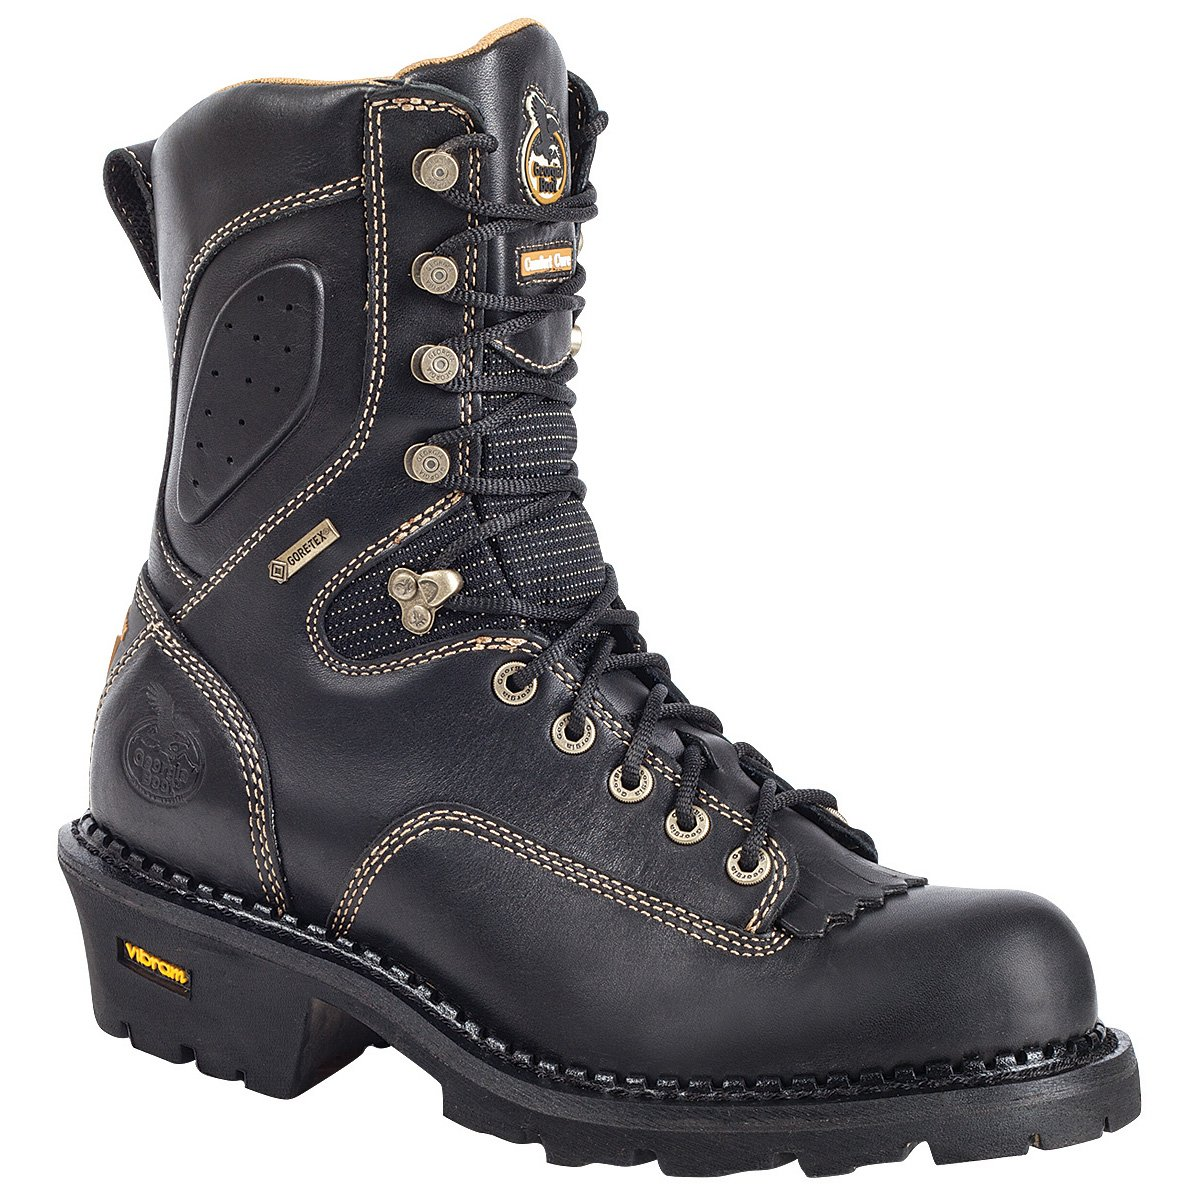 Georgia Men's Composite Toe Core Logger Boots,Black,8 M